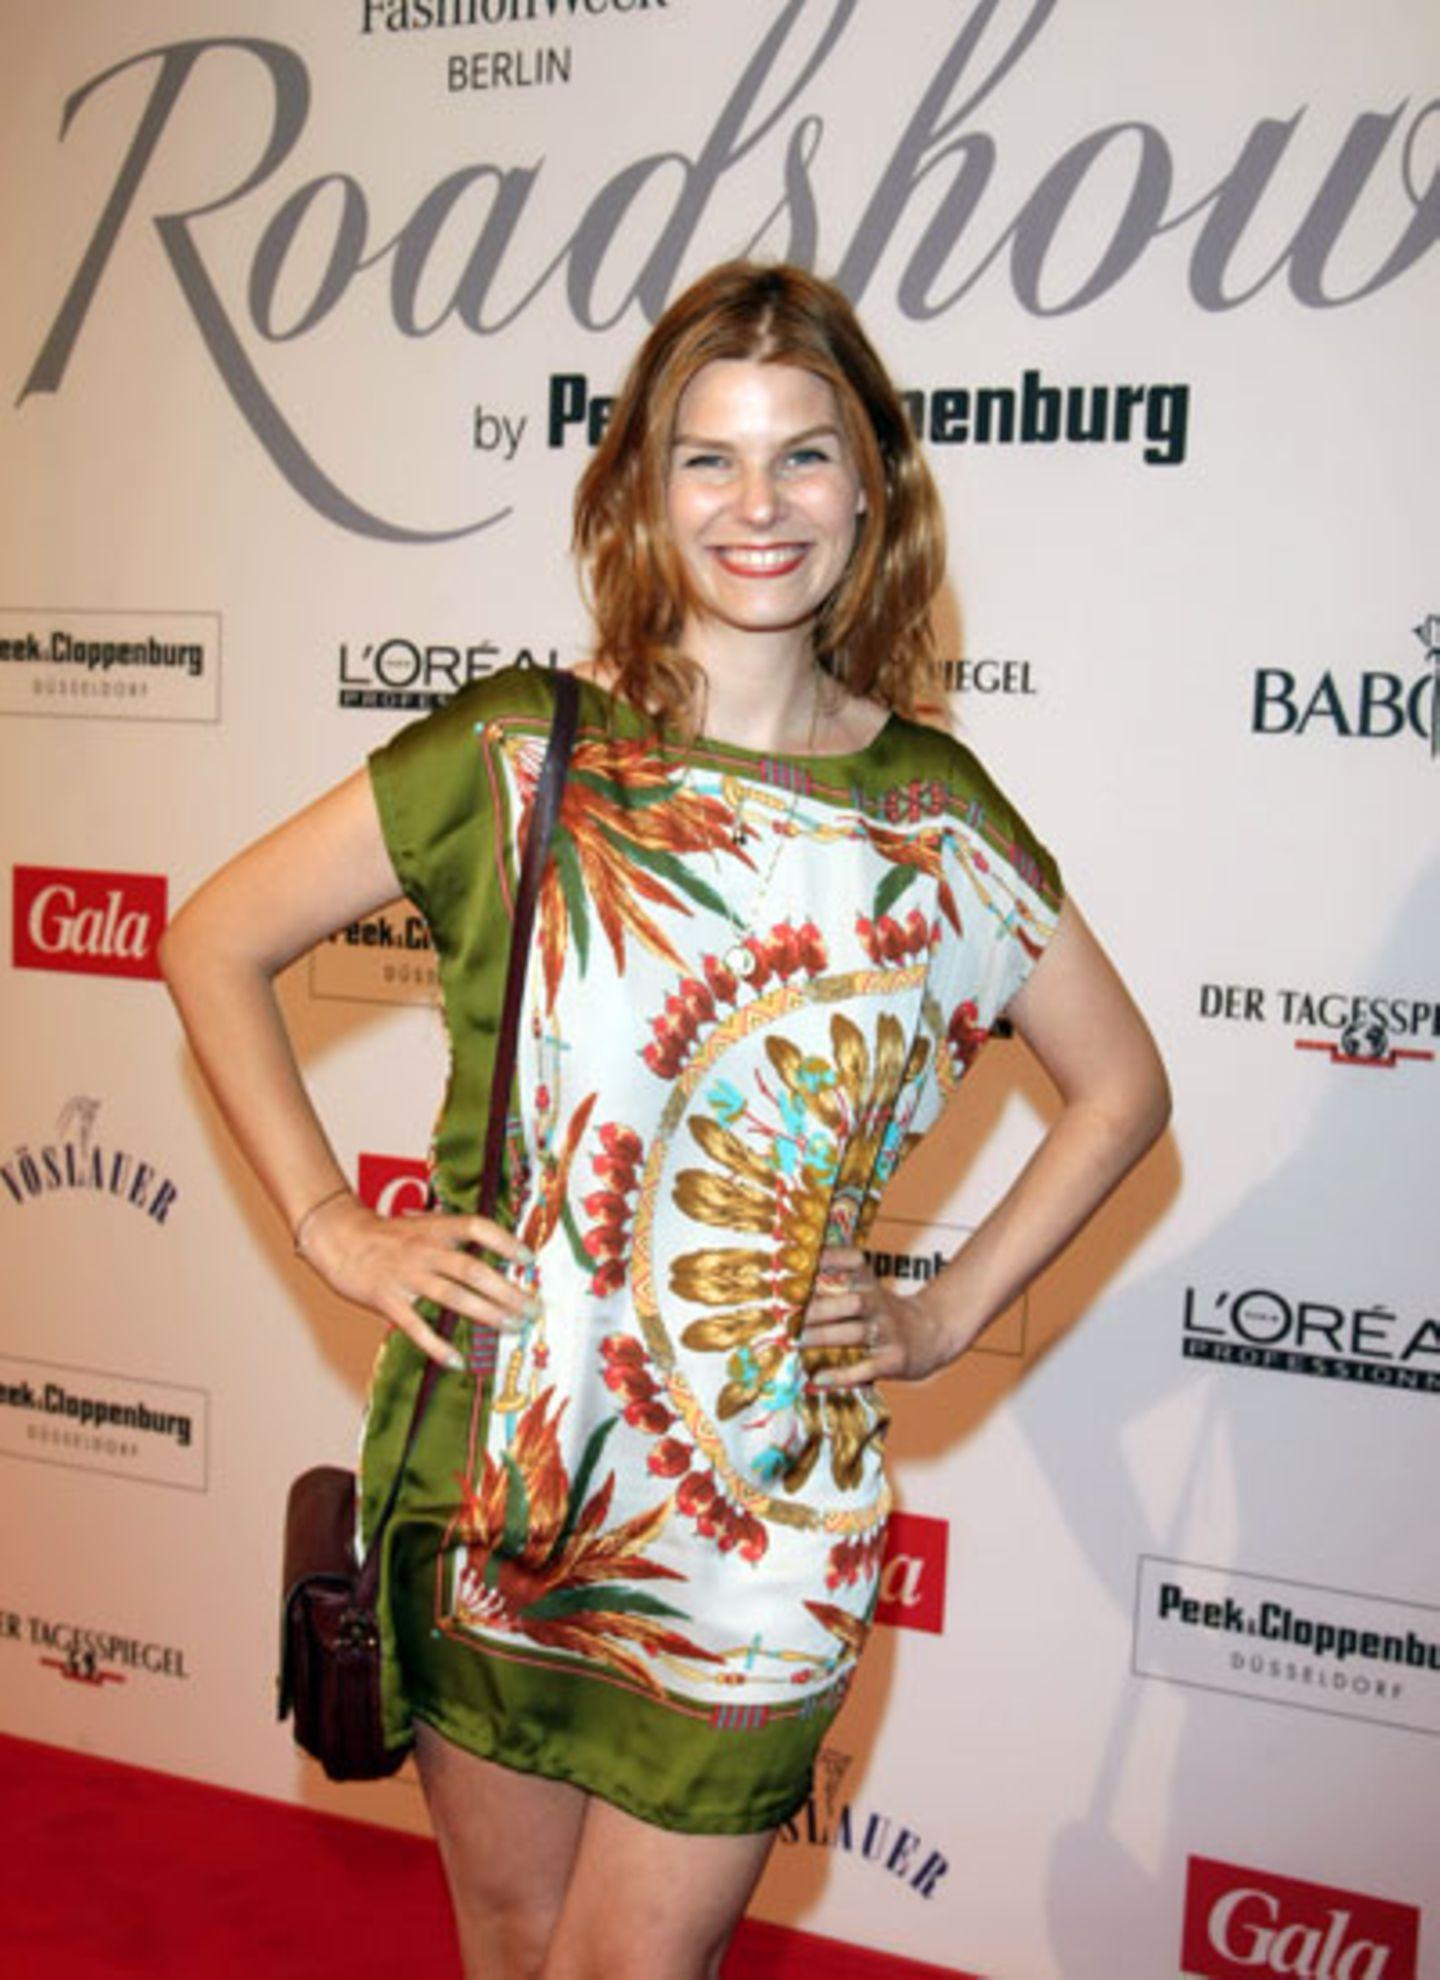 fashion-show: die p&c roadshow | gala.de